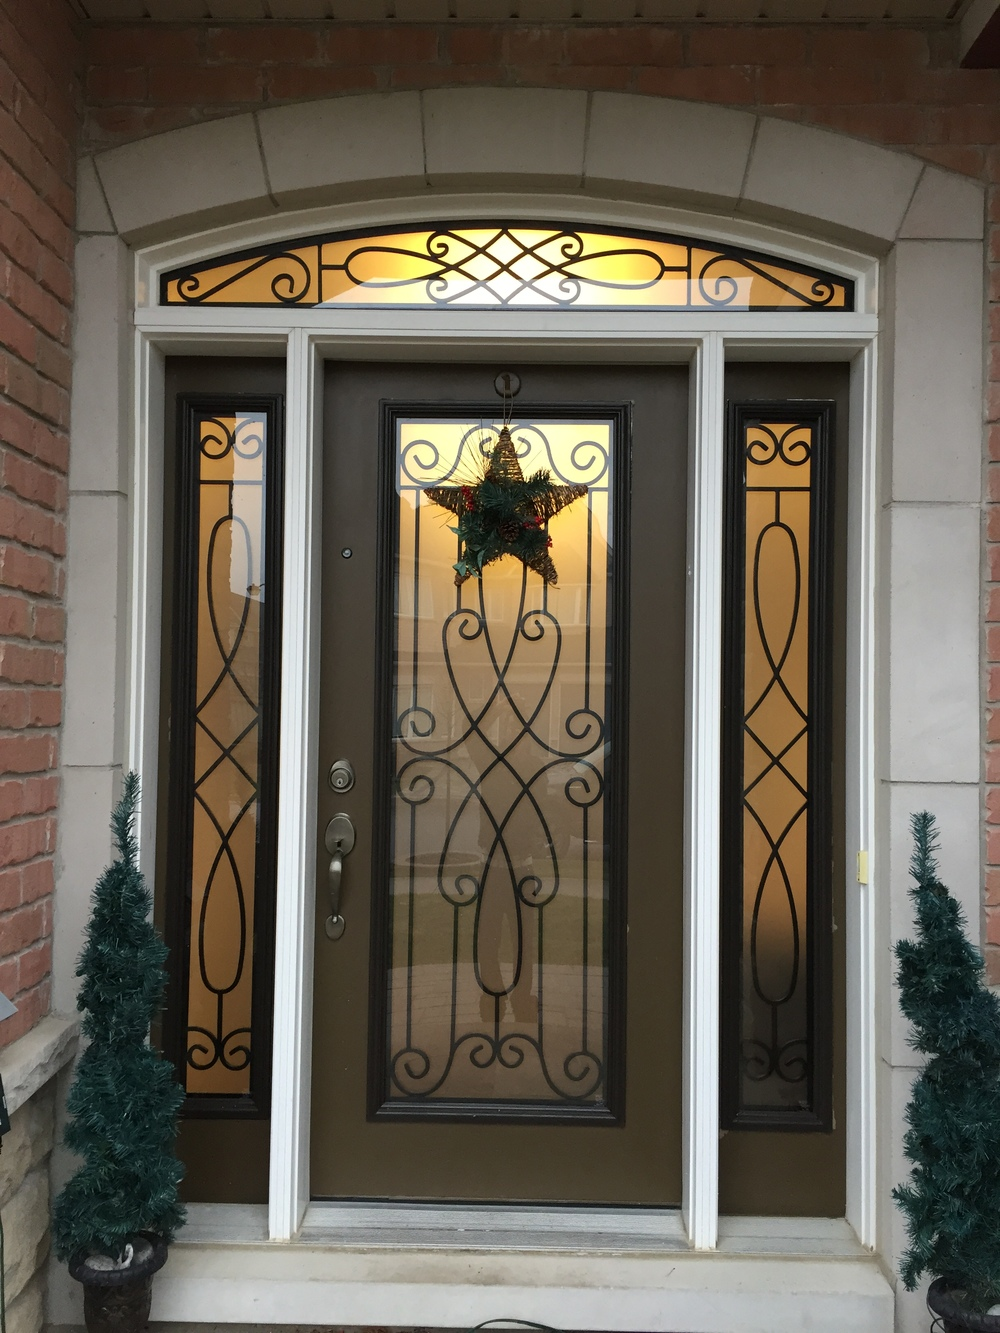 Nottingham-Wrought-Iron-Glass-Door-Inserts-Innisfil-Ontario